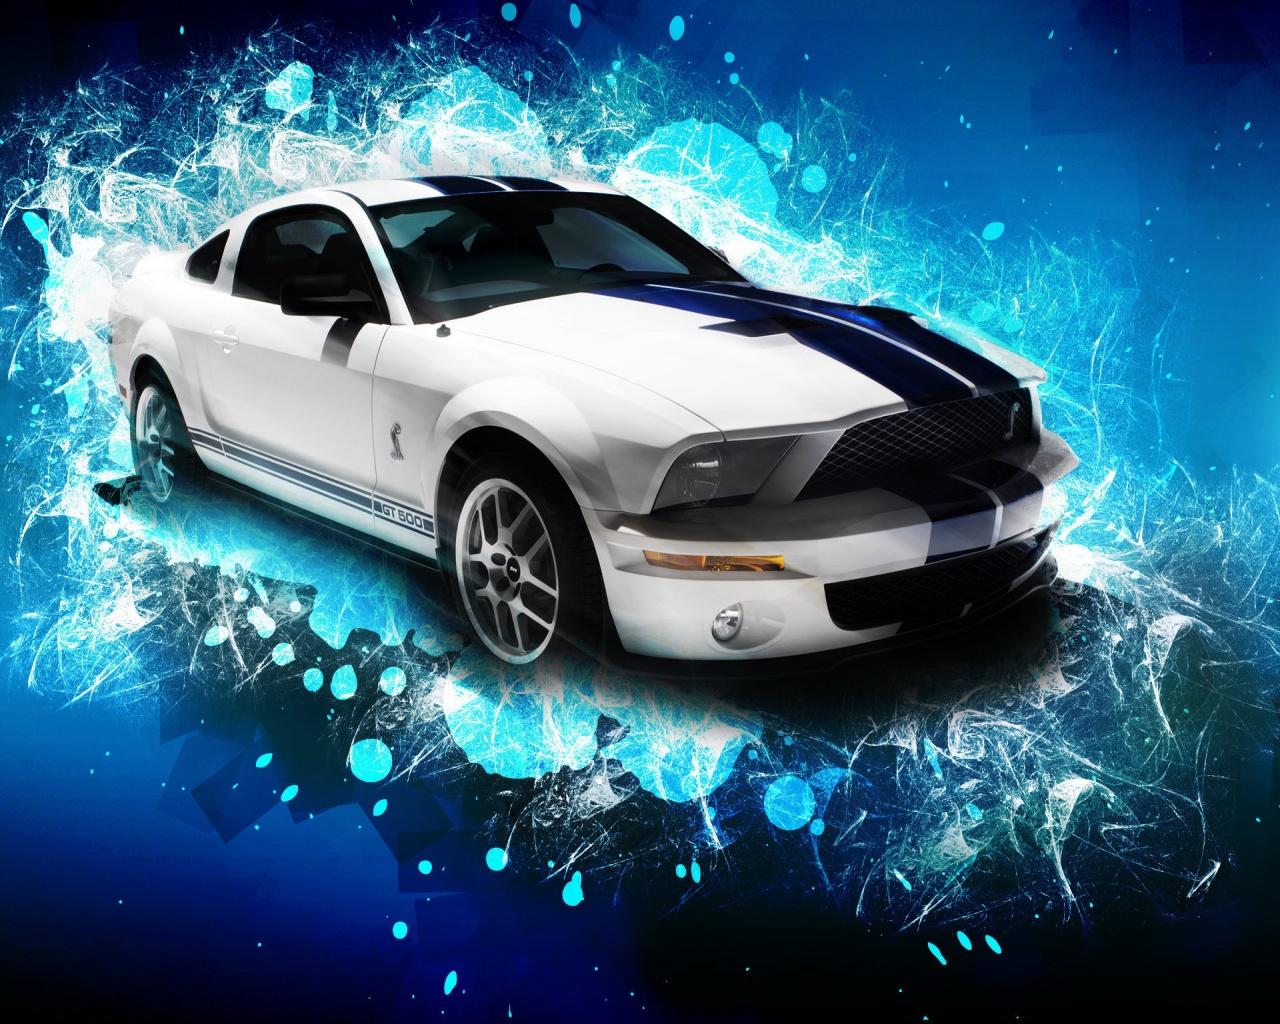 http://3.bp.blogspot.com/--SBGK52RGh4/Th7GCkF1OYI/AAAAAAAAAJs/Nyo7dhG0xPU/s1600/Wallpaper+Mustang.jpg